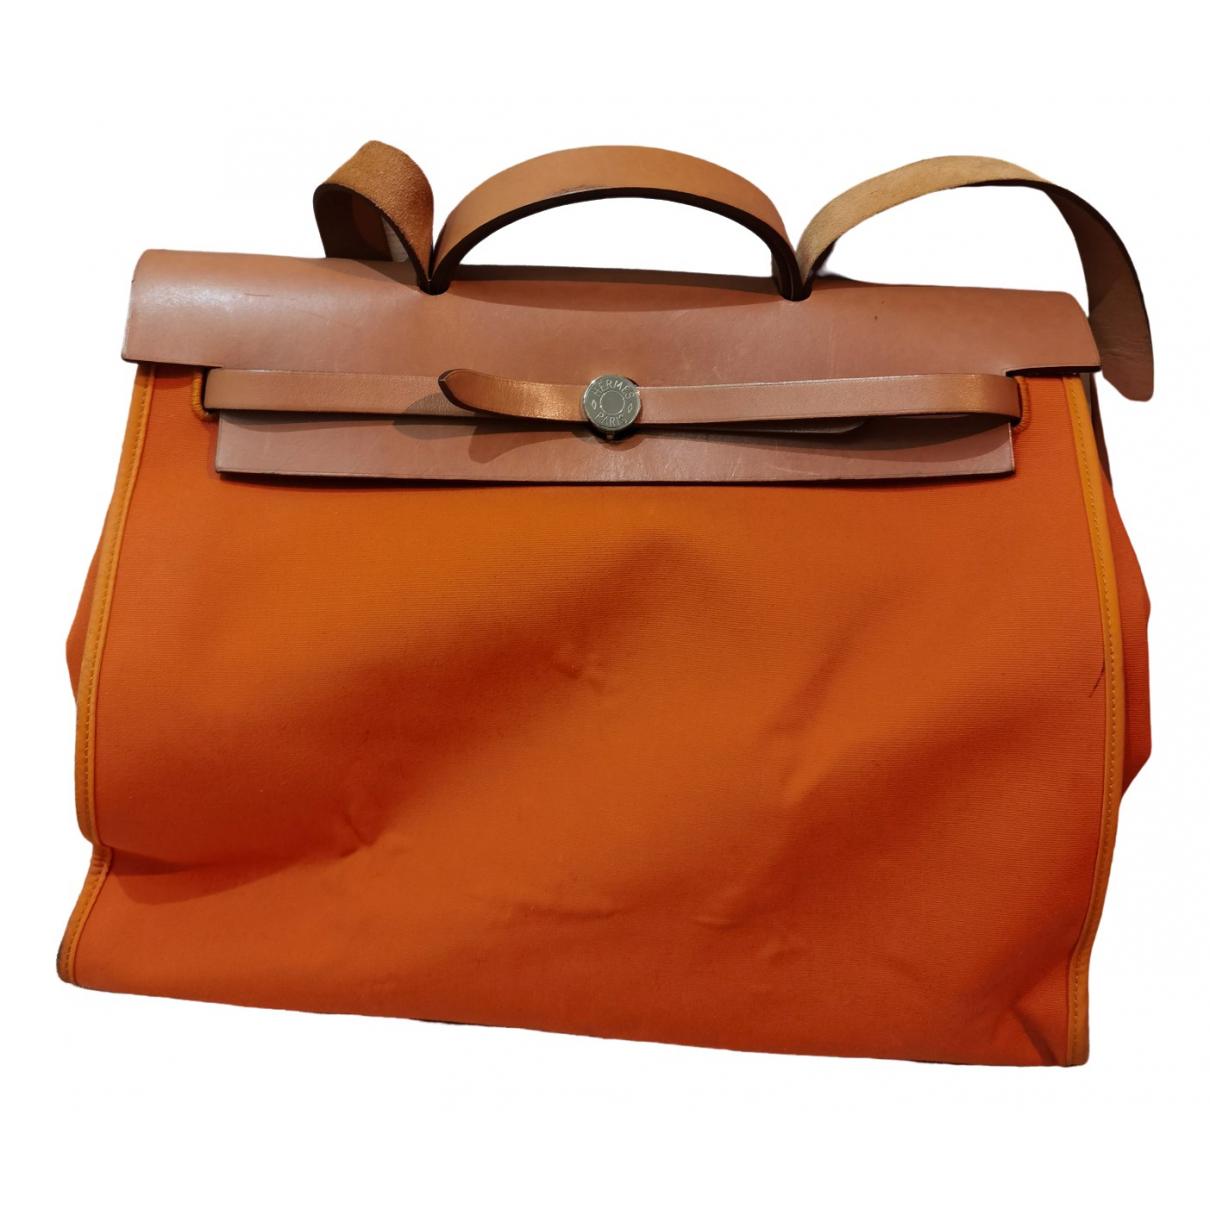 Hermes - Sac a main Herbag pour femme en cuir - orange